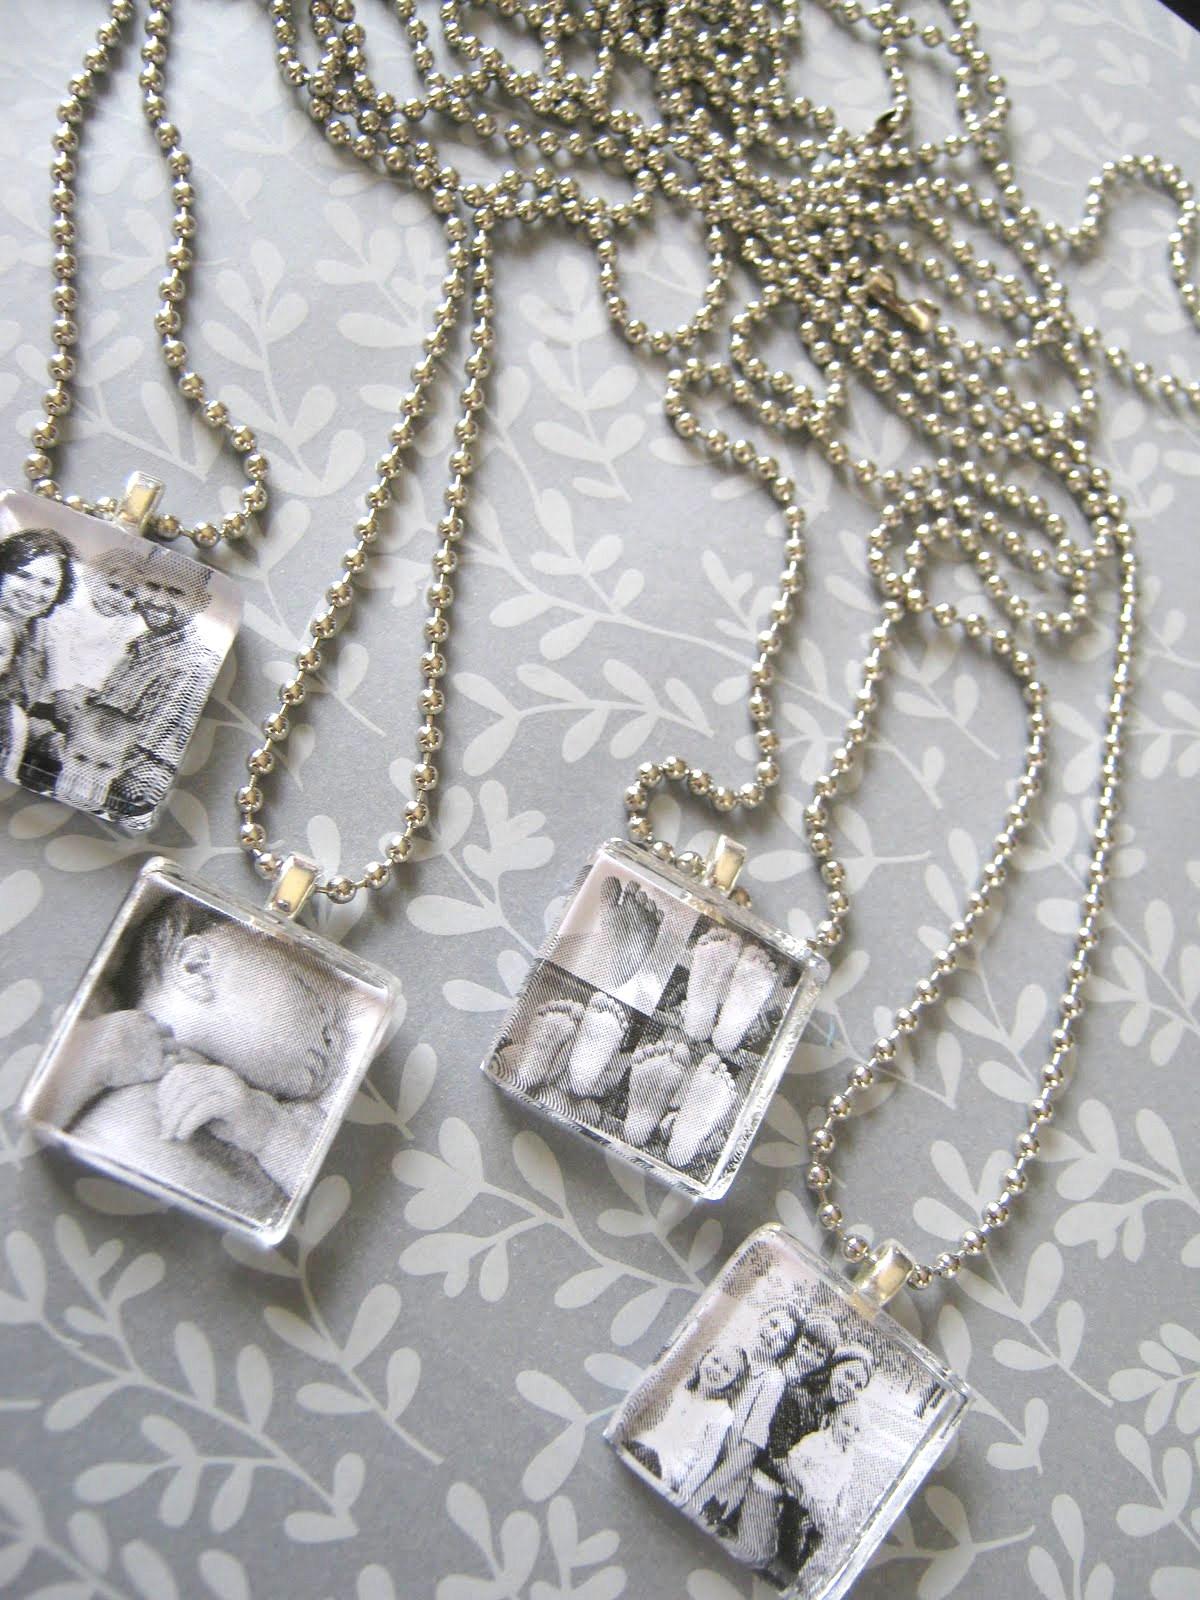 Handmade Natural Gemstone Wire Wrapped Gold Freeform ...  |Diy Custom Jewelry Pendant